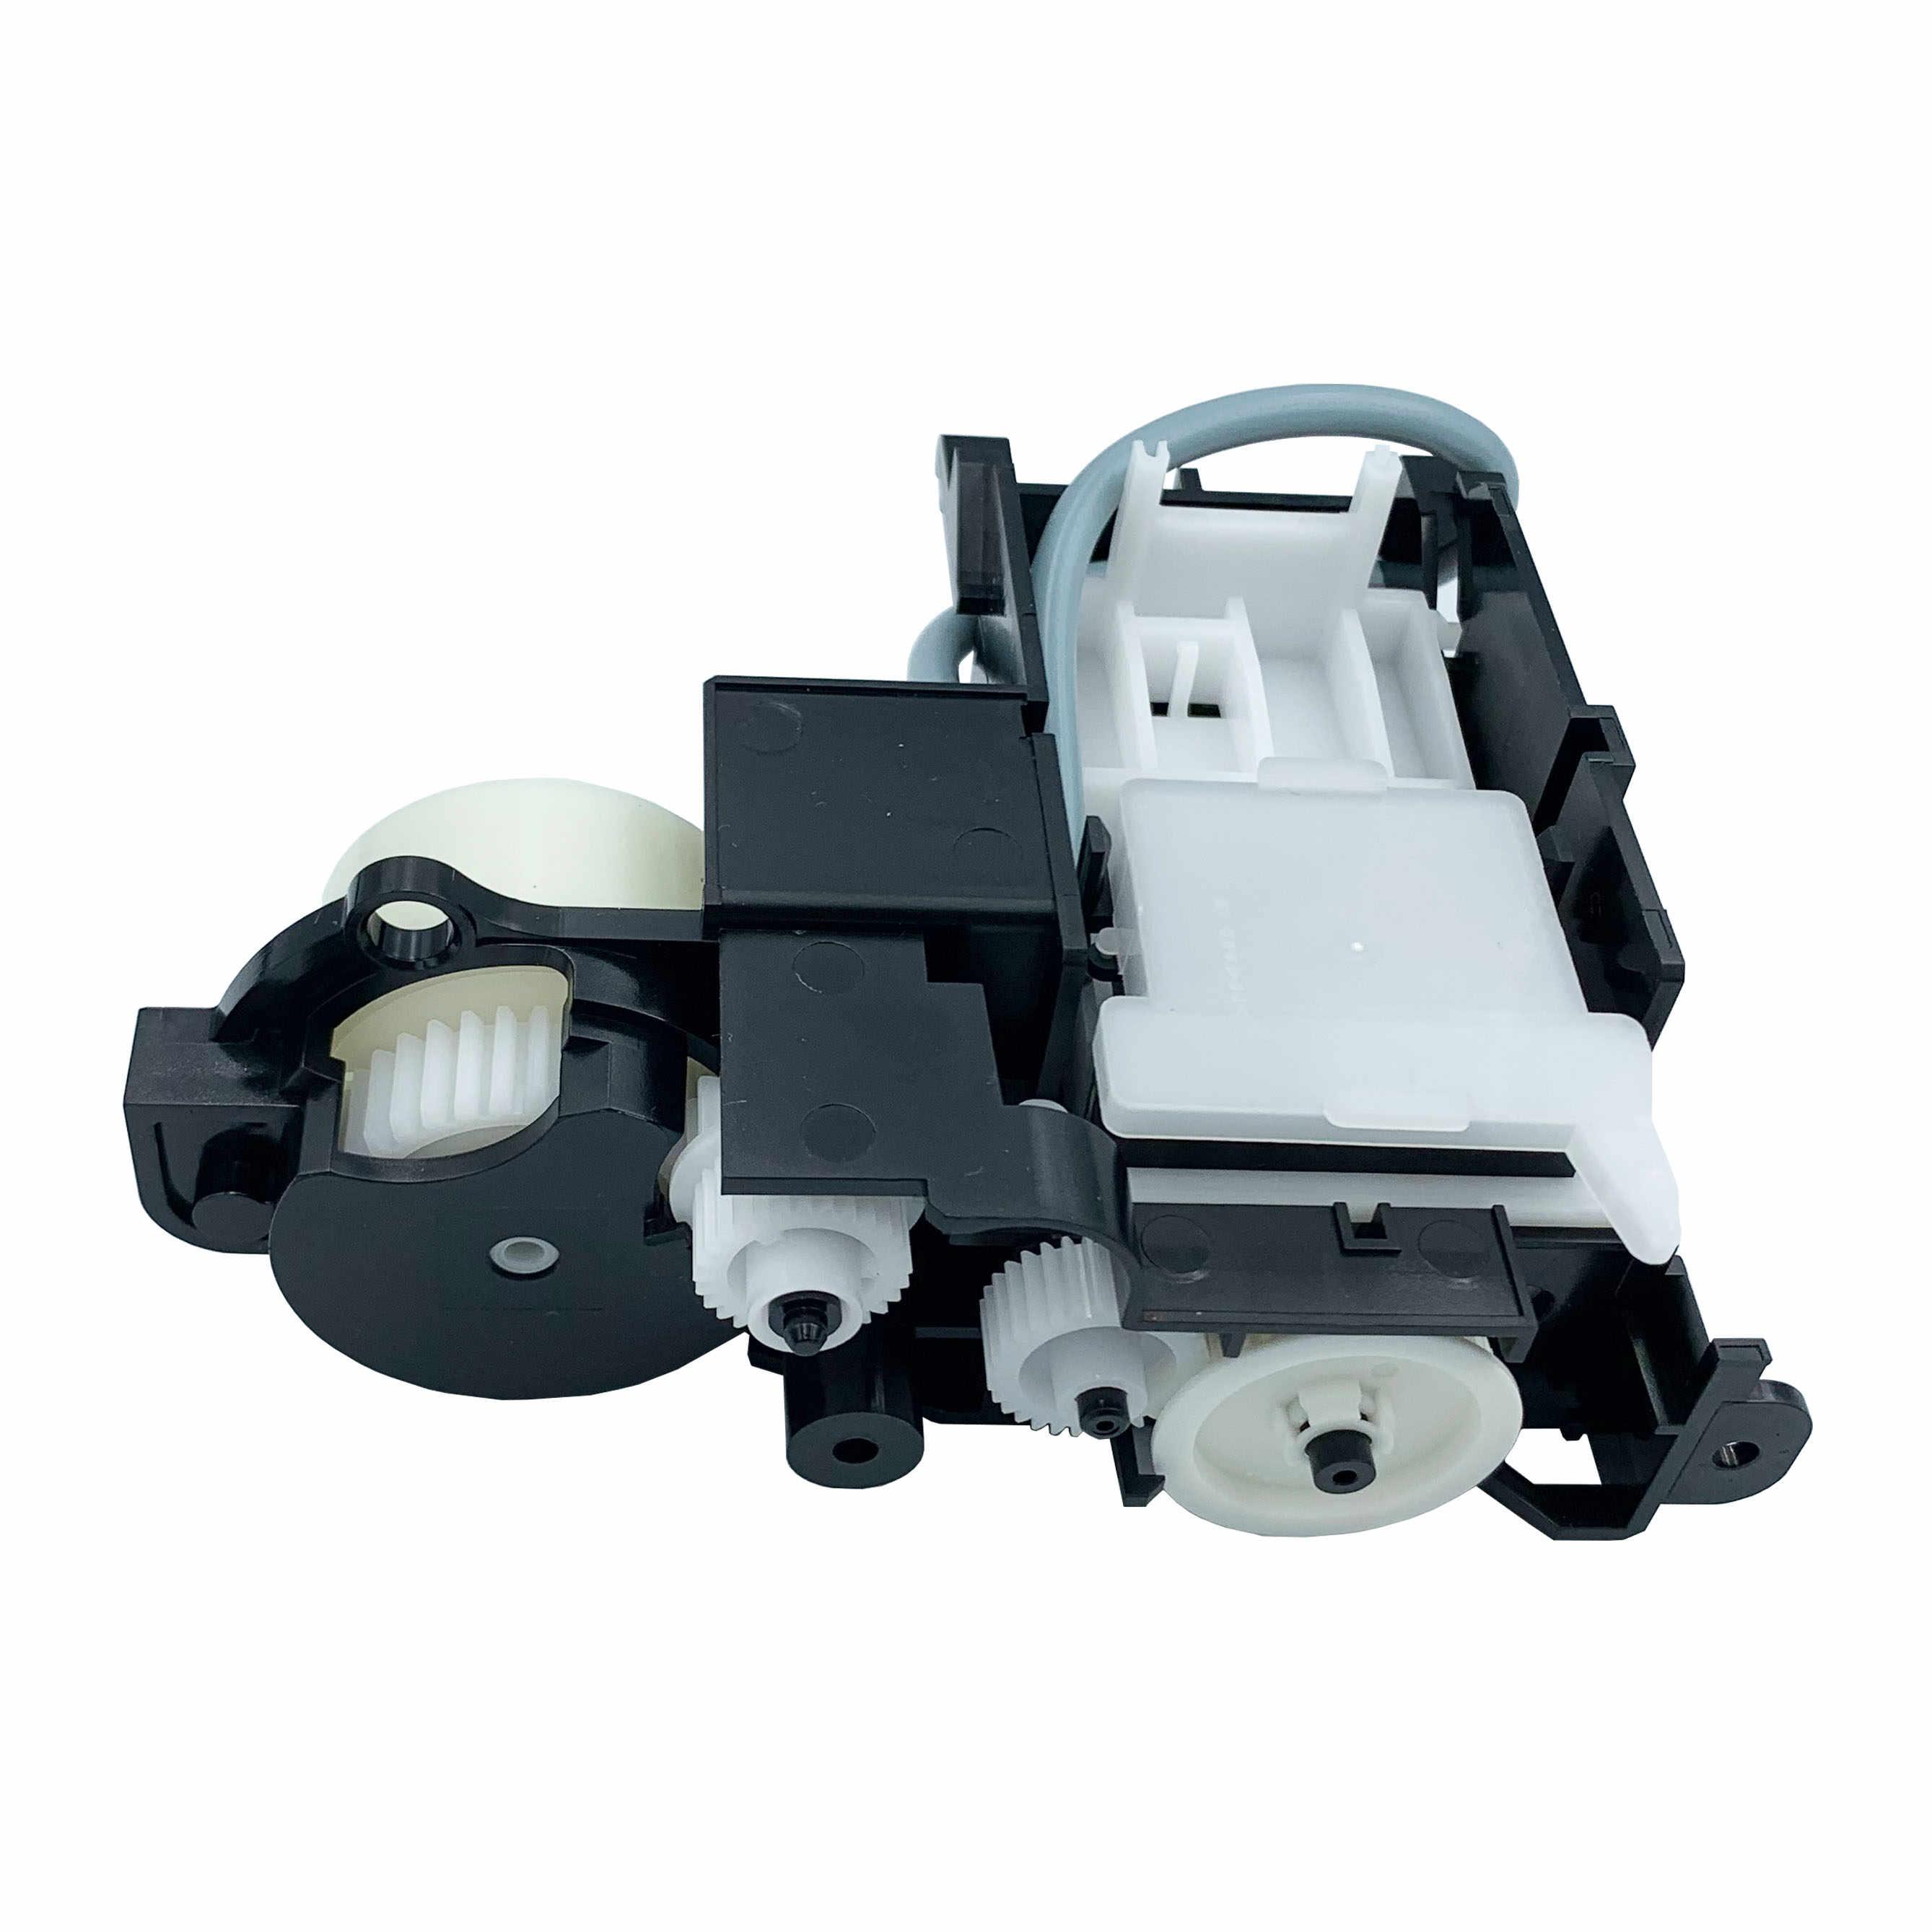 Baru Asli Capping Stasiun untuk Epson A50 P50 T50 T59 T60 R260 R270 L800 L801 L805 R285 R280 R390 Pompa perakitan Sistem Tinta ASSY